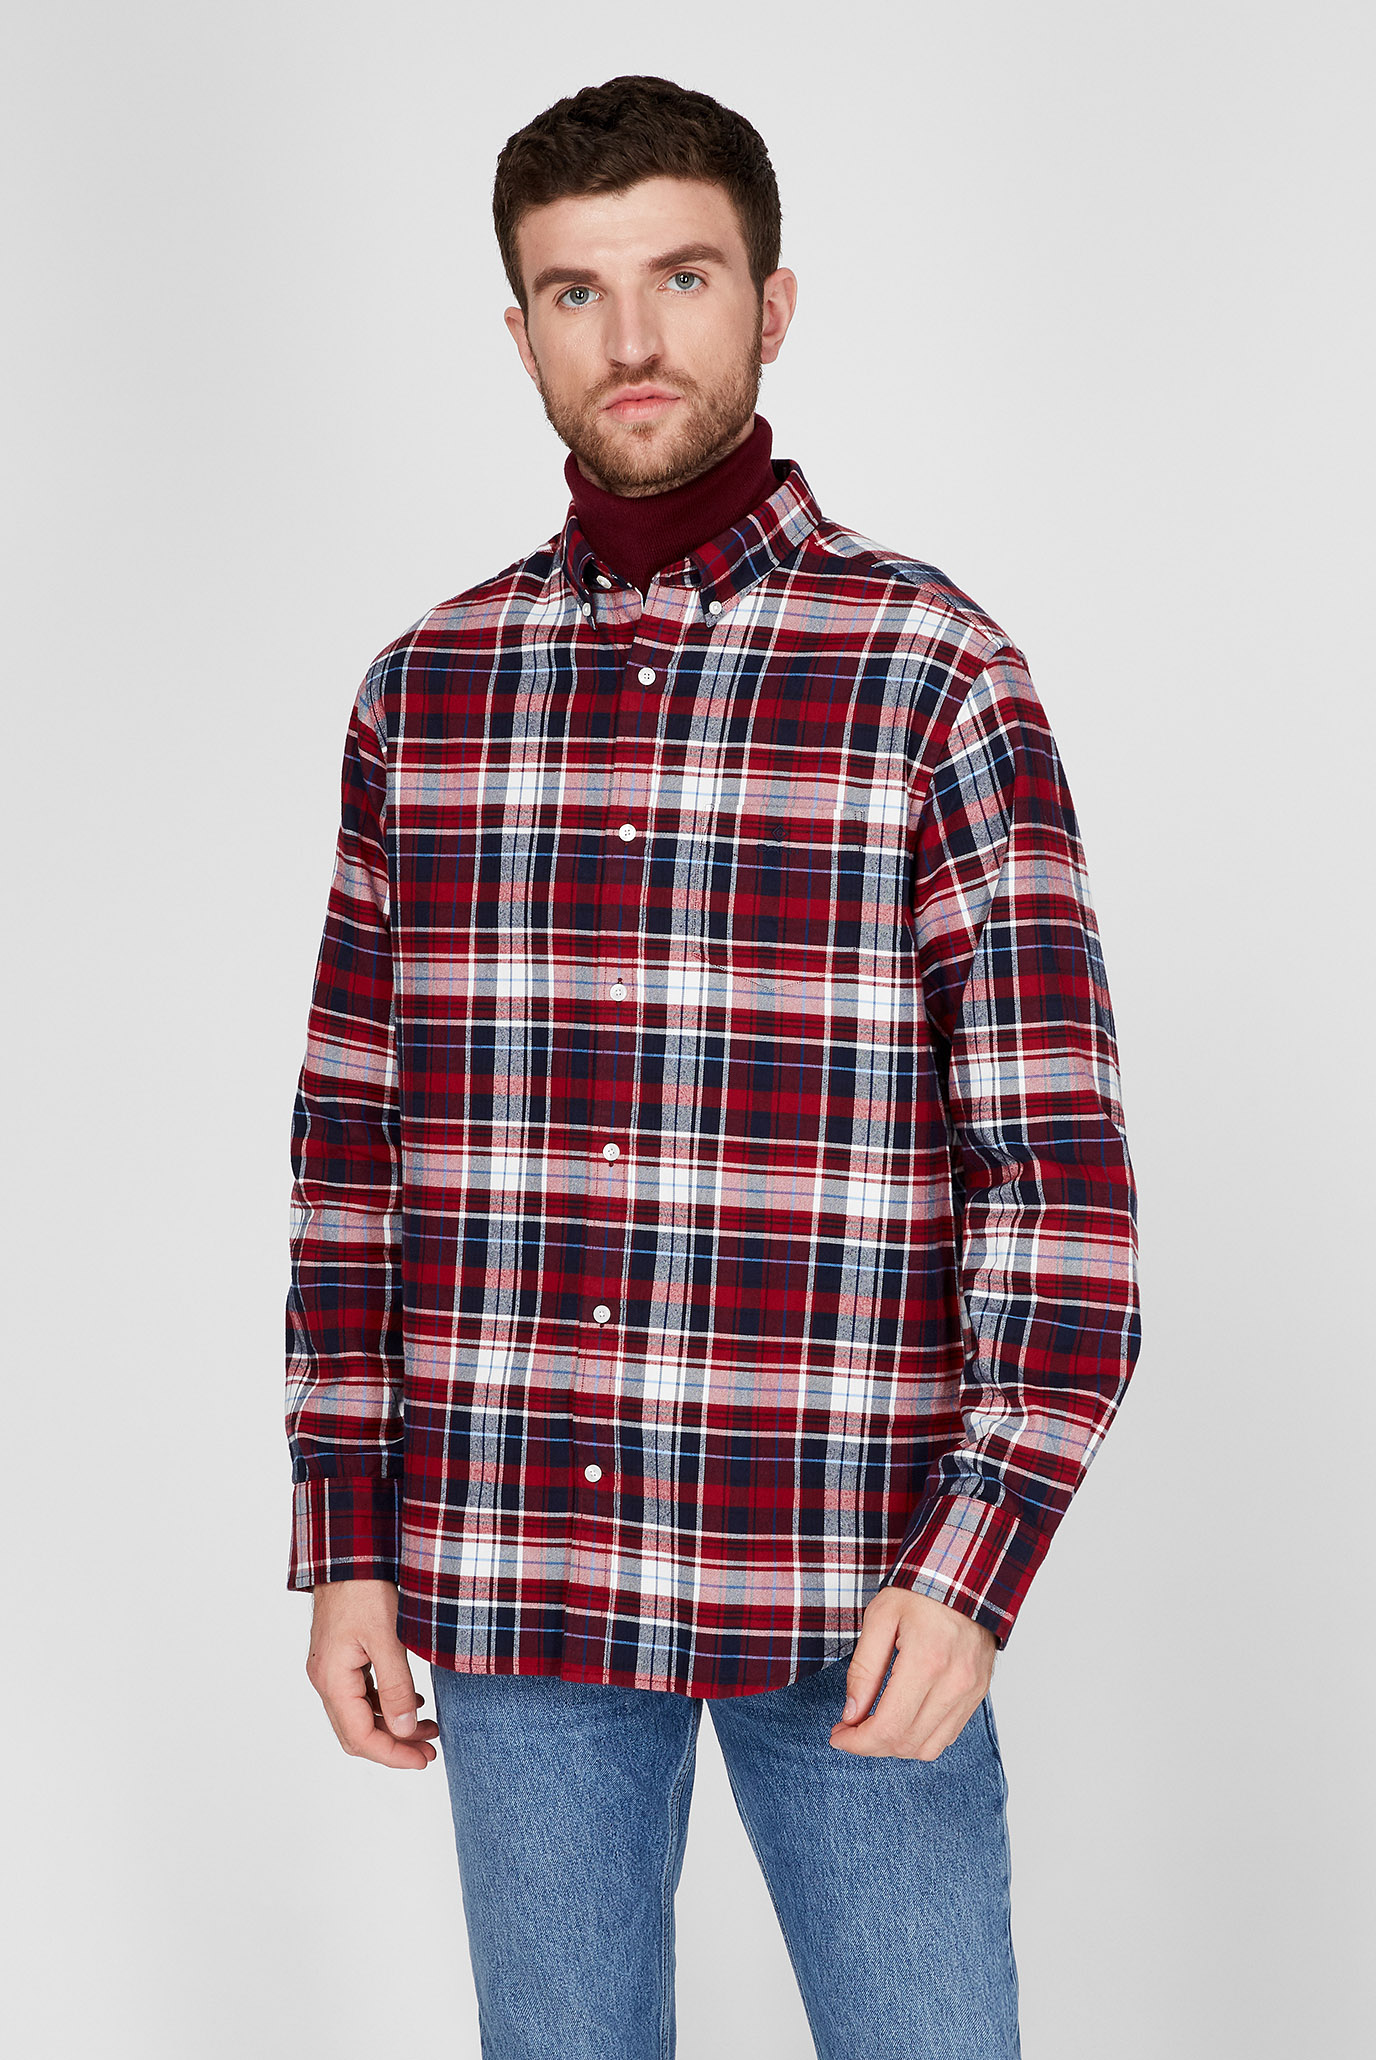 Мужская рубашка в клетку BRUSHED OXFORD PLAID 1